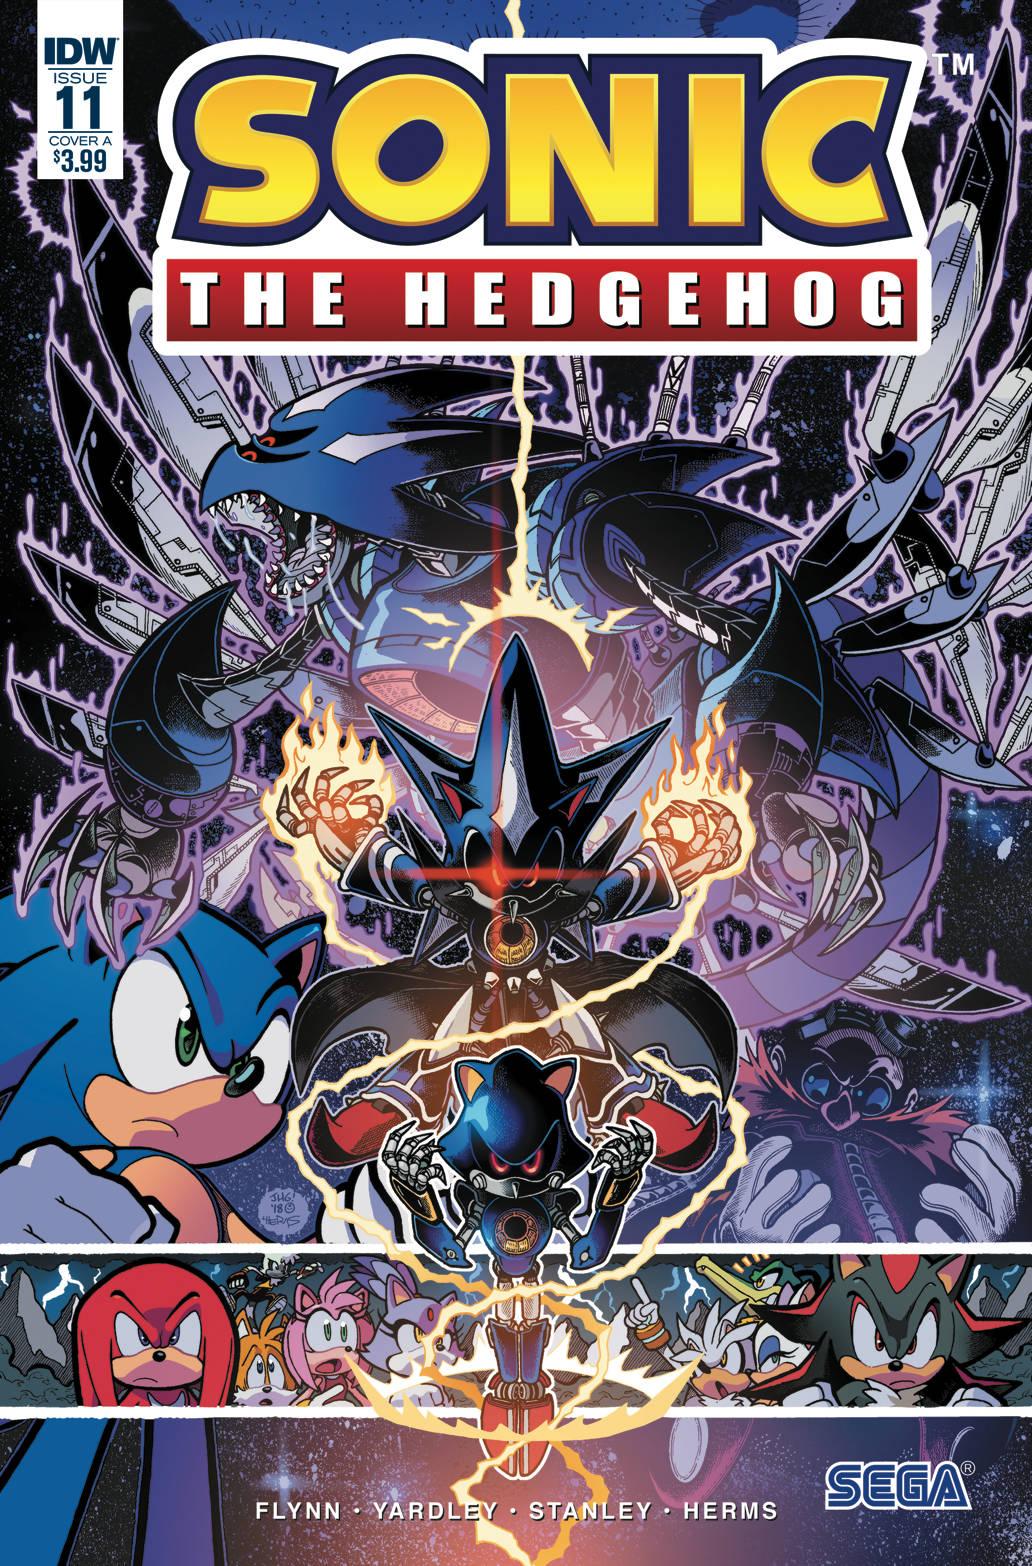 Sonic The Hedgehog #11 (2018)